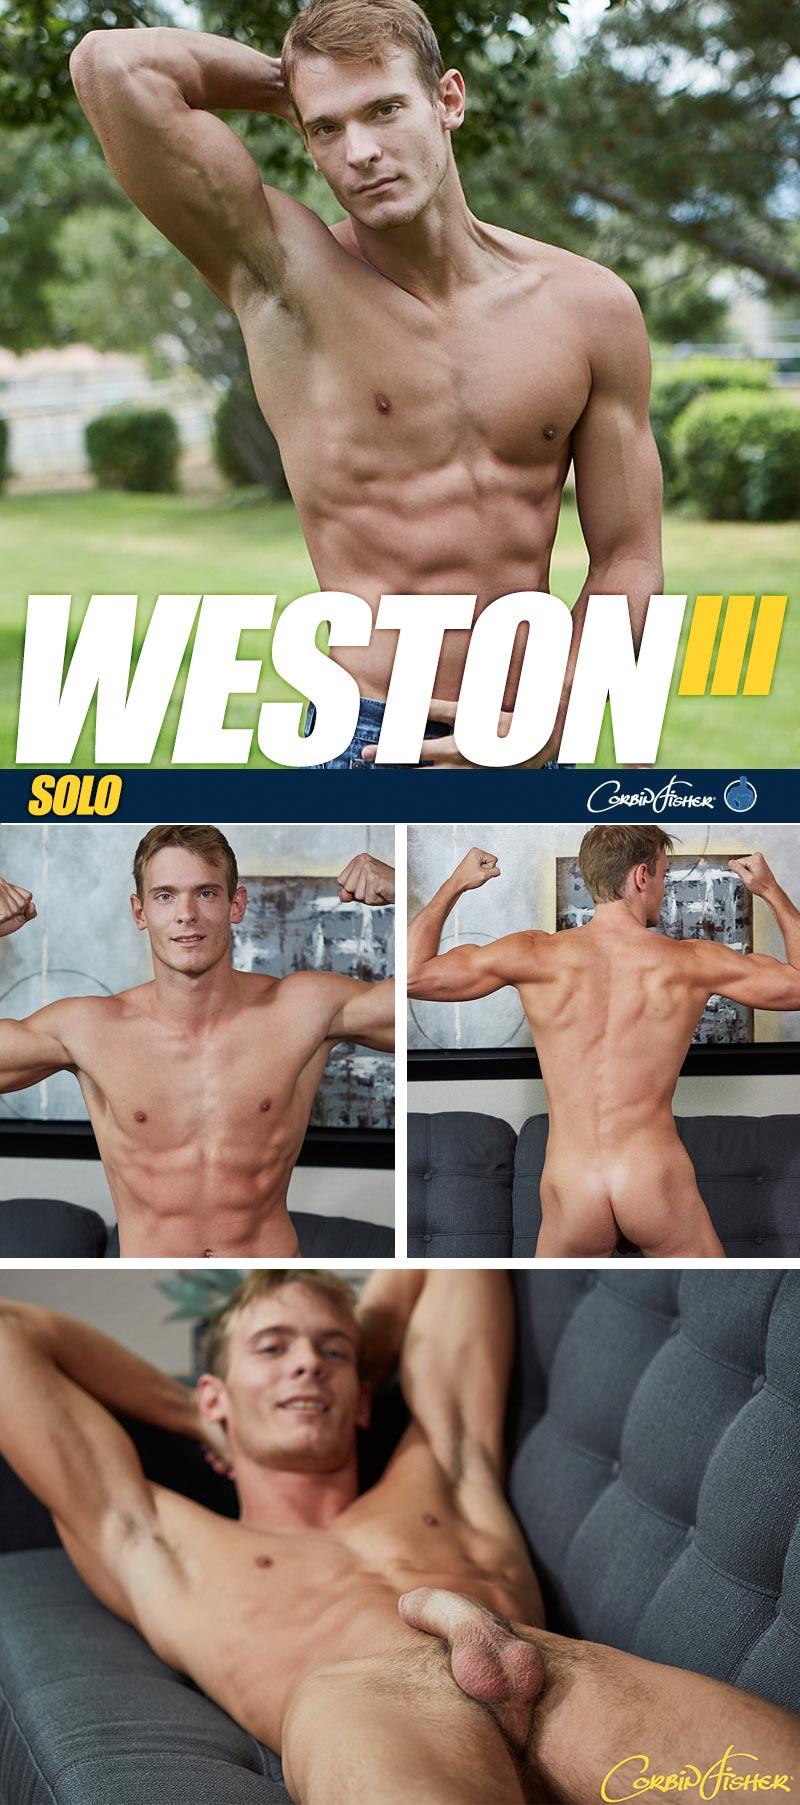 Weston (III) at CorbinFisher